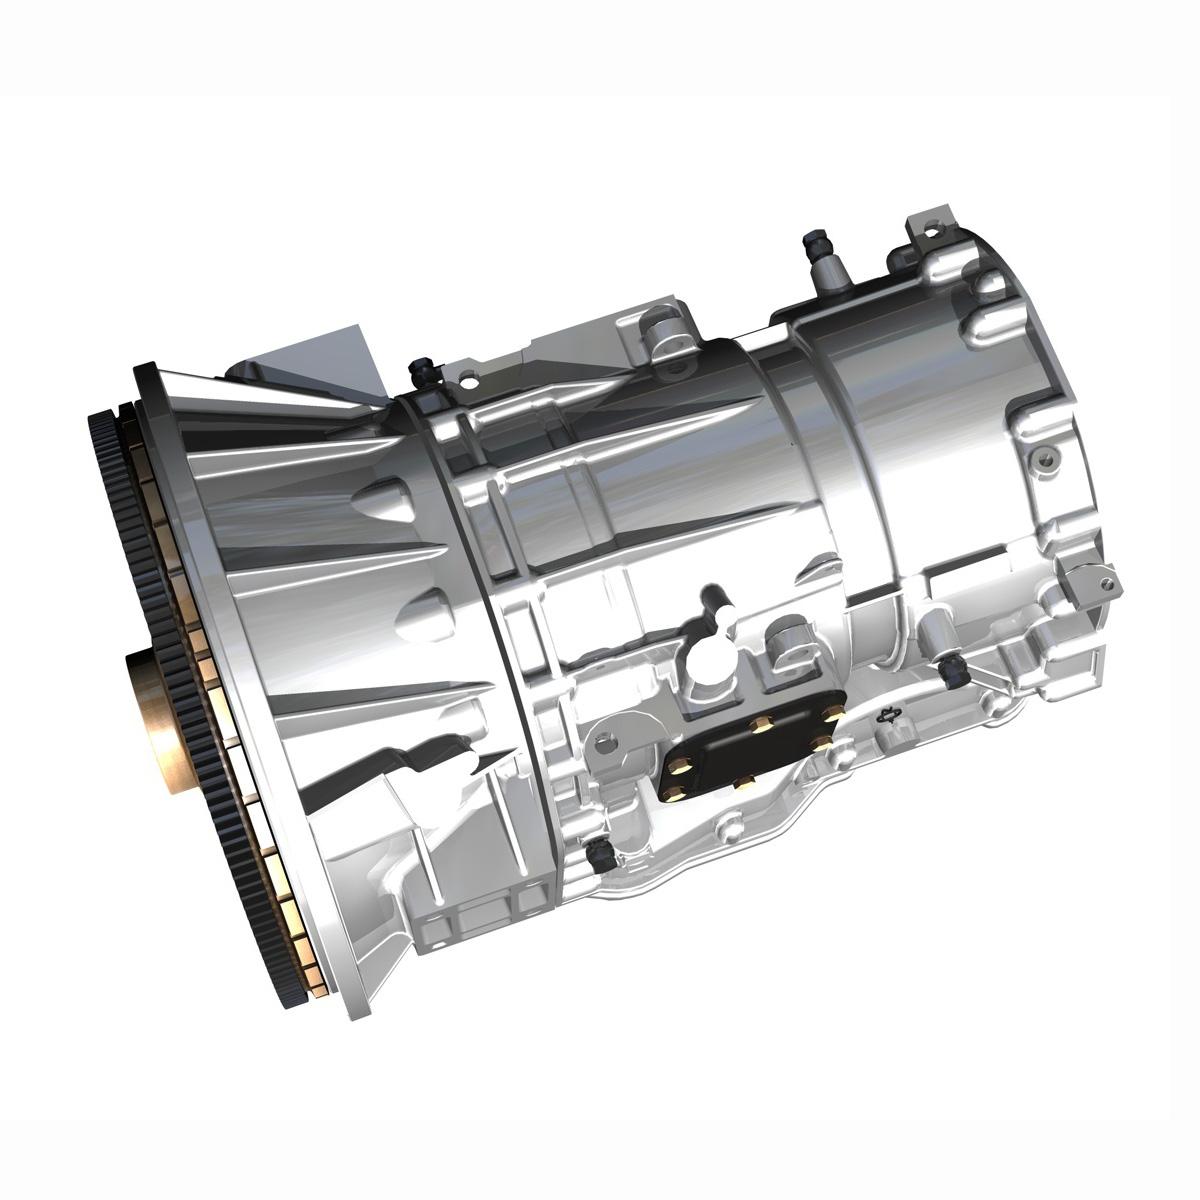 gearing – transmission 3d model 3ds fbx c4d lwo obj 189235